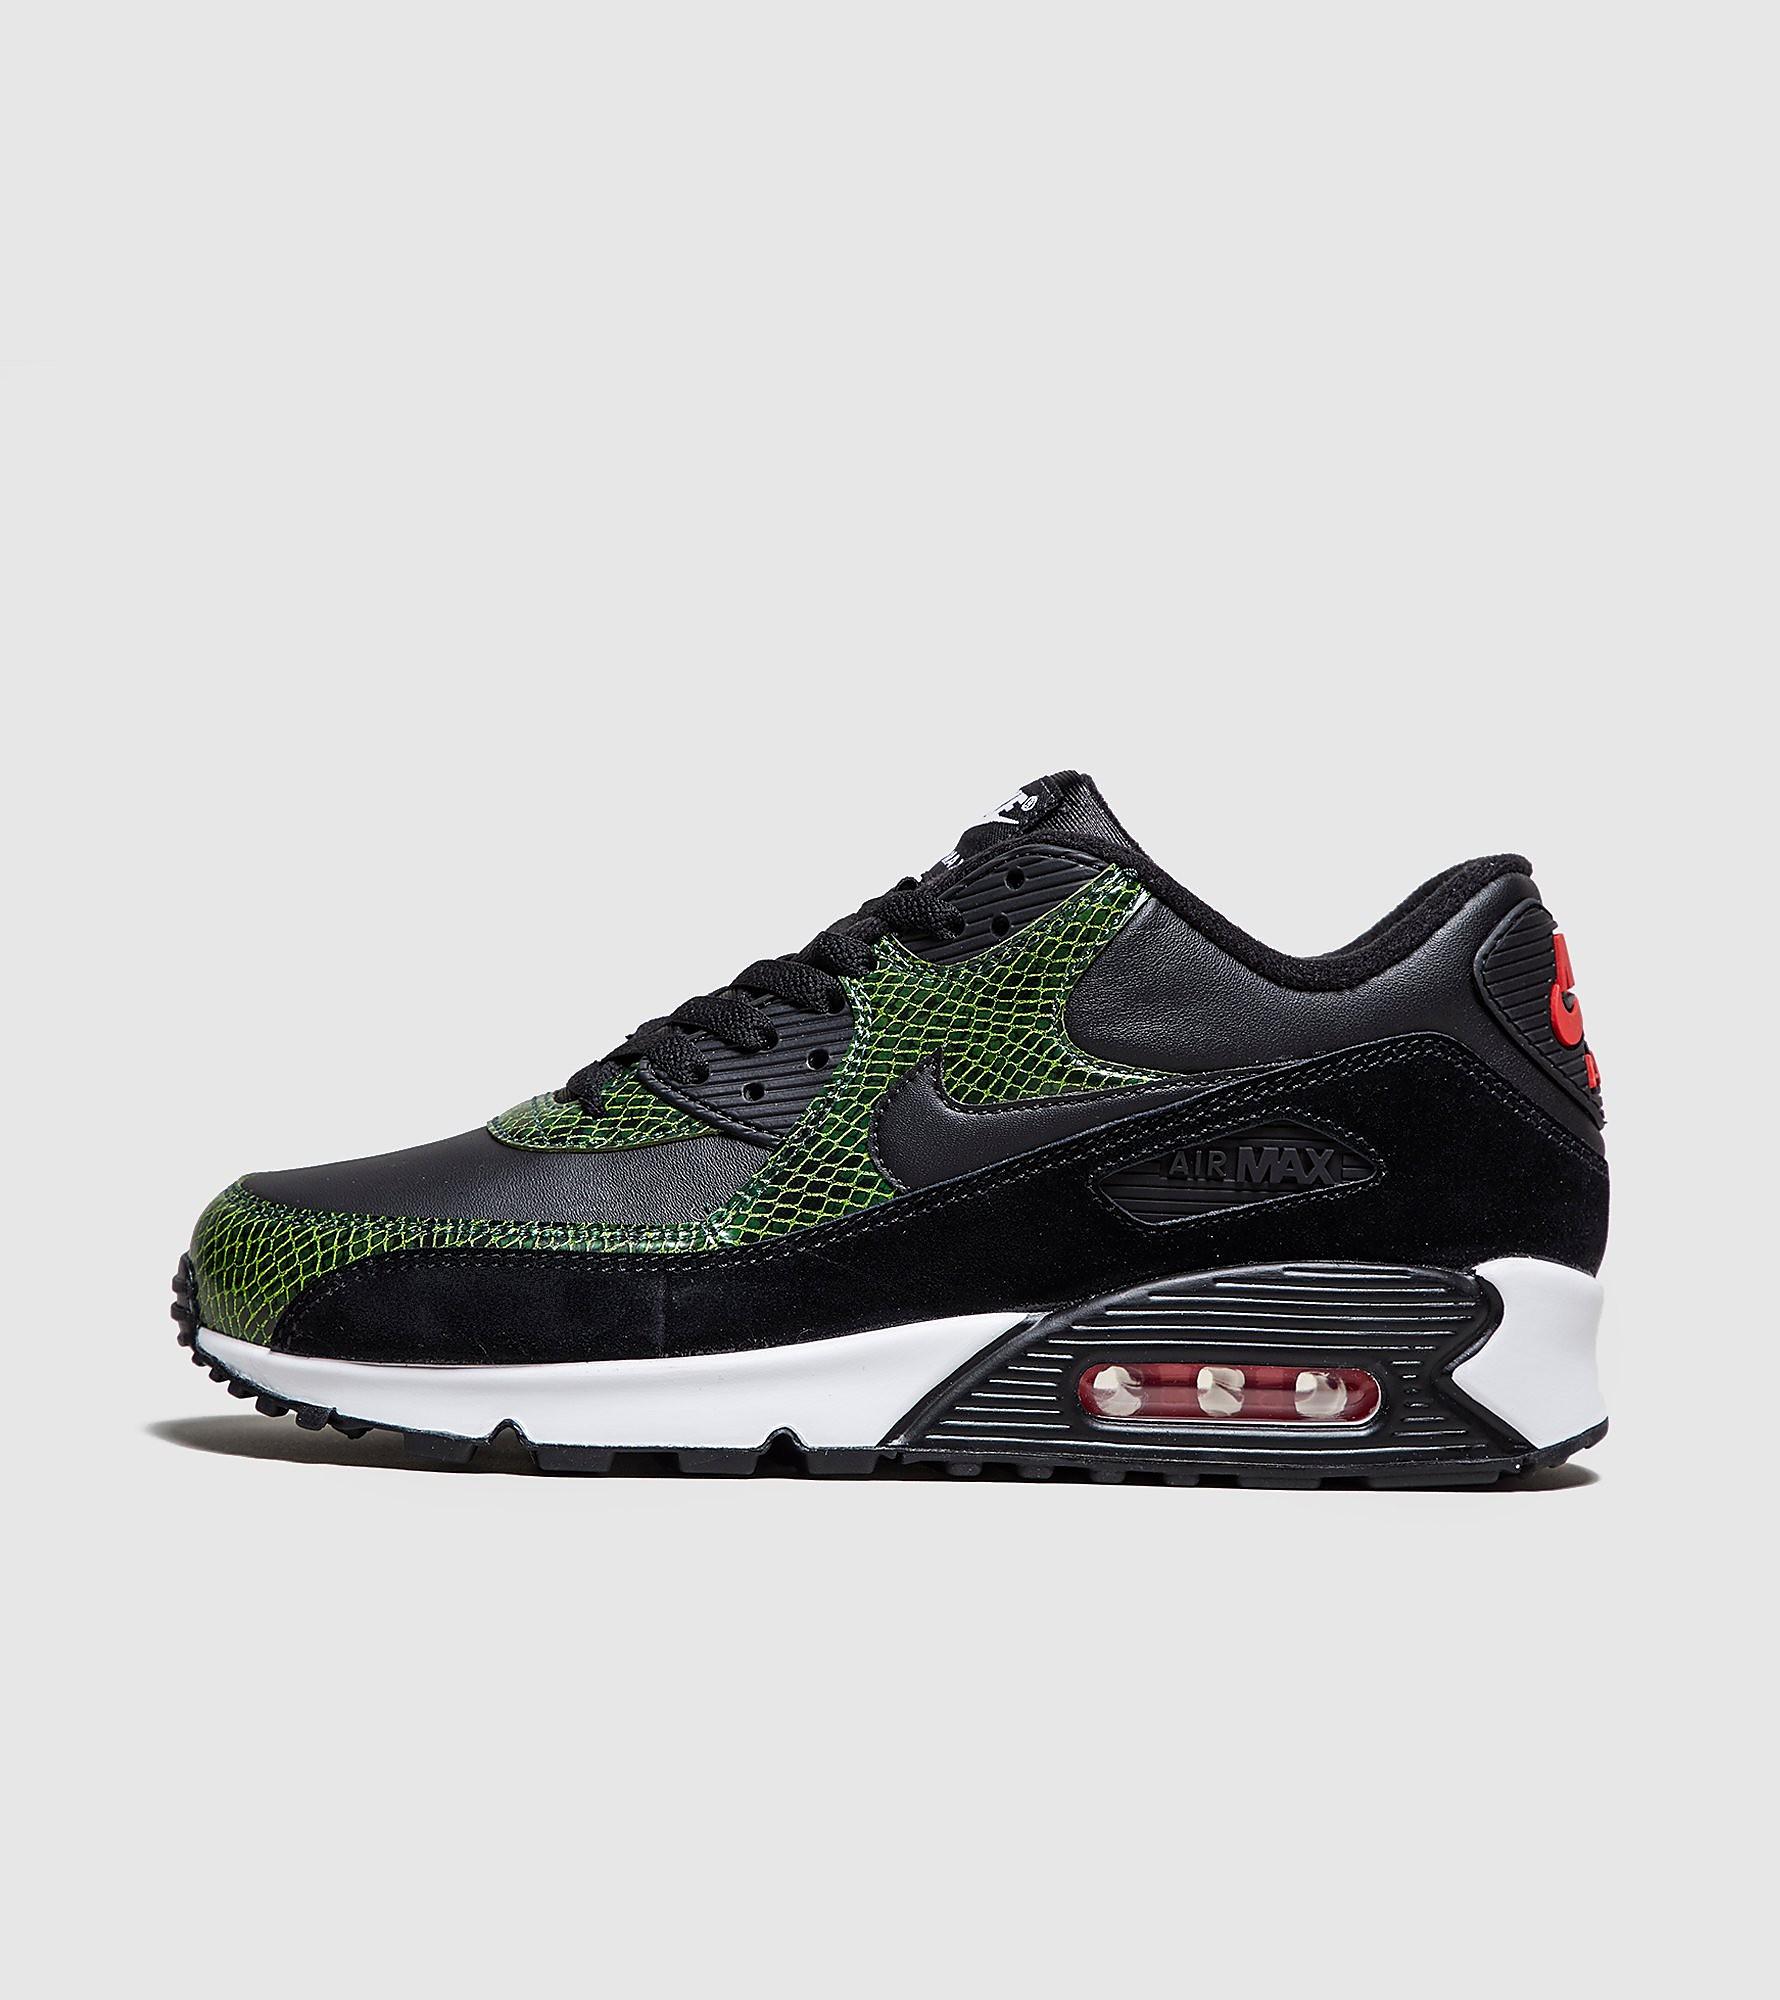 Nike Air Max 90 QS 'Python', Negro